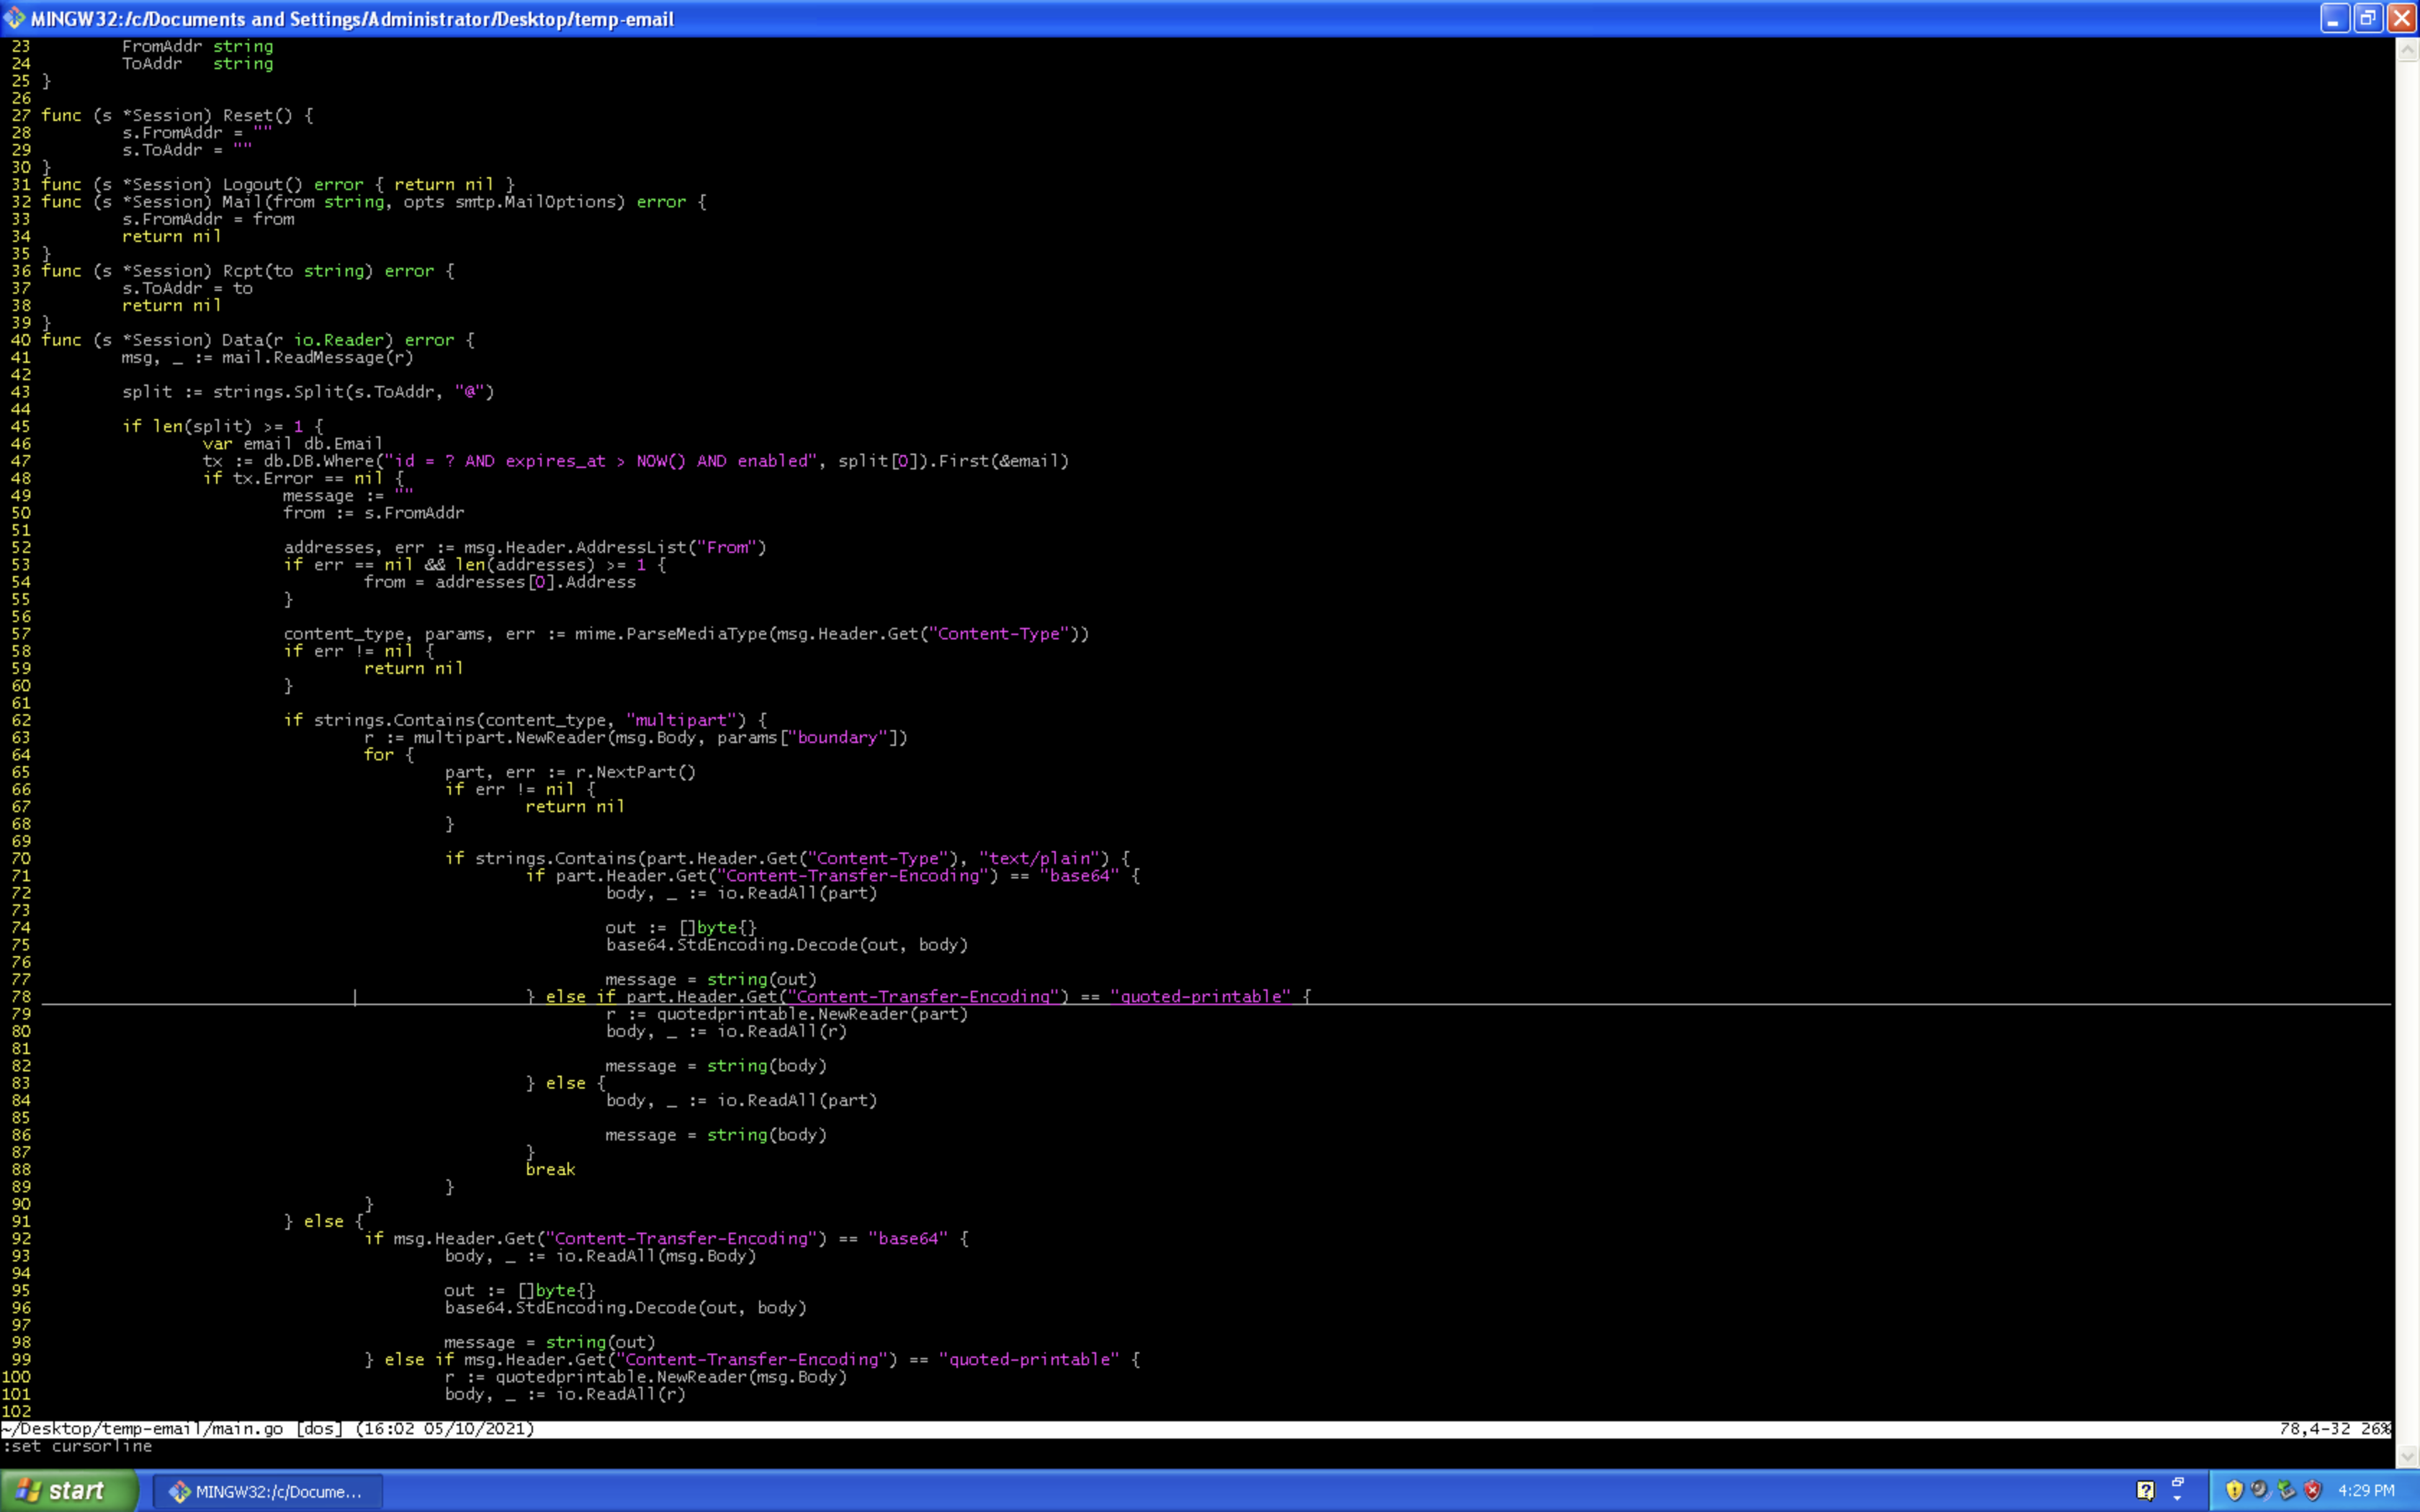 https://cloud-lgbu5gcnb-hack-club-bot.vercel.app/0screen_shot_2021-10-05_at_4.30.04_pm.png